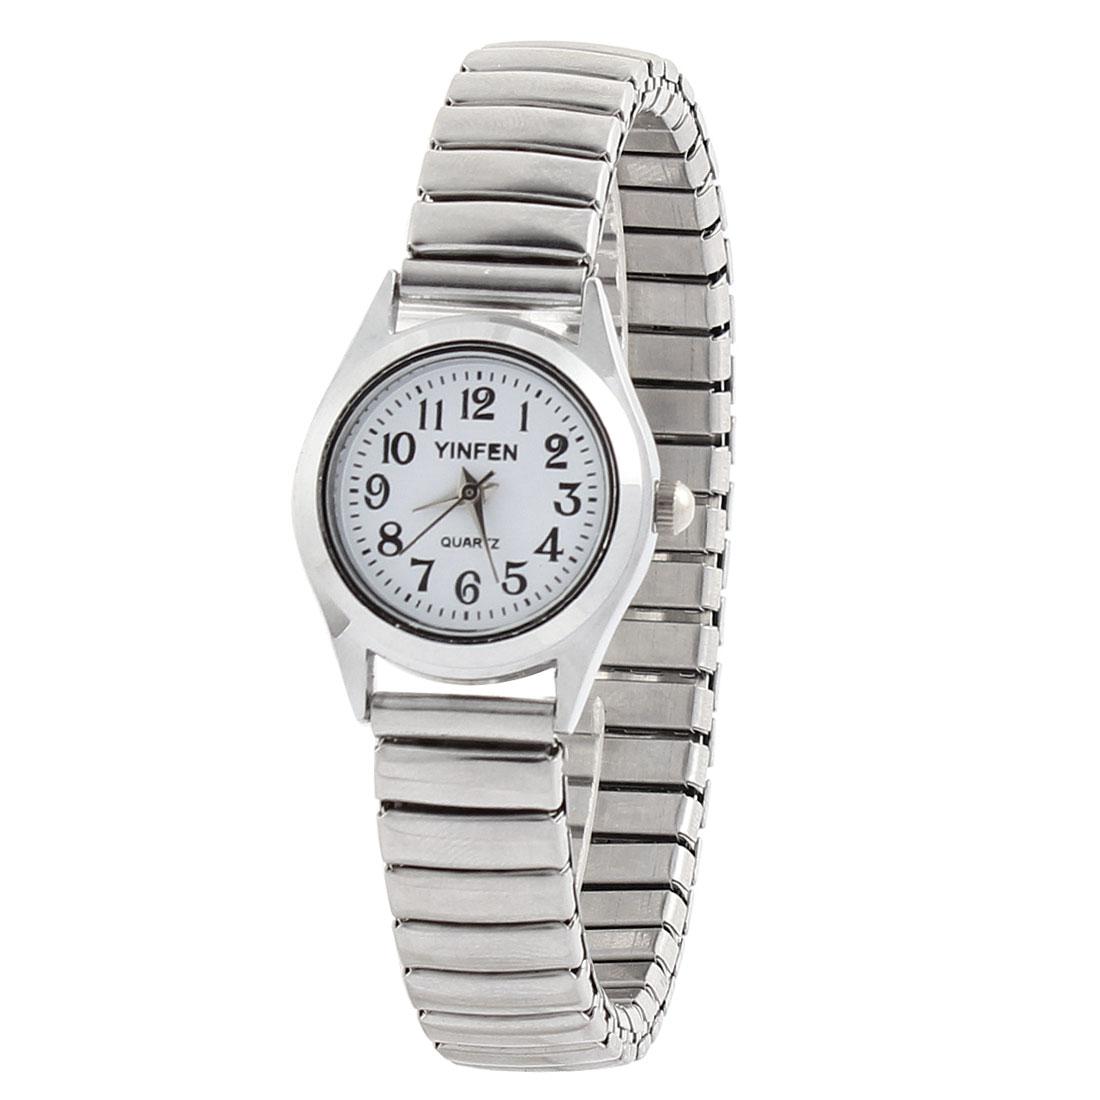 Lady Fashion Arabic Numeral Round Dial Watchcase Elastic Band Metal Wrist Watch